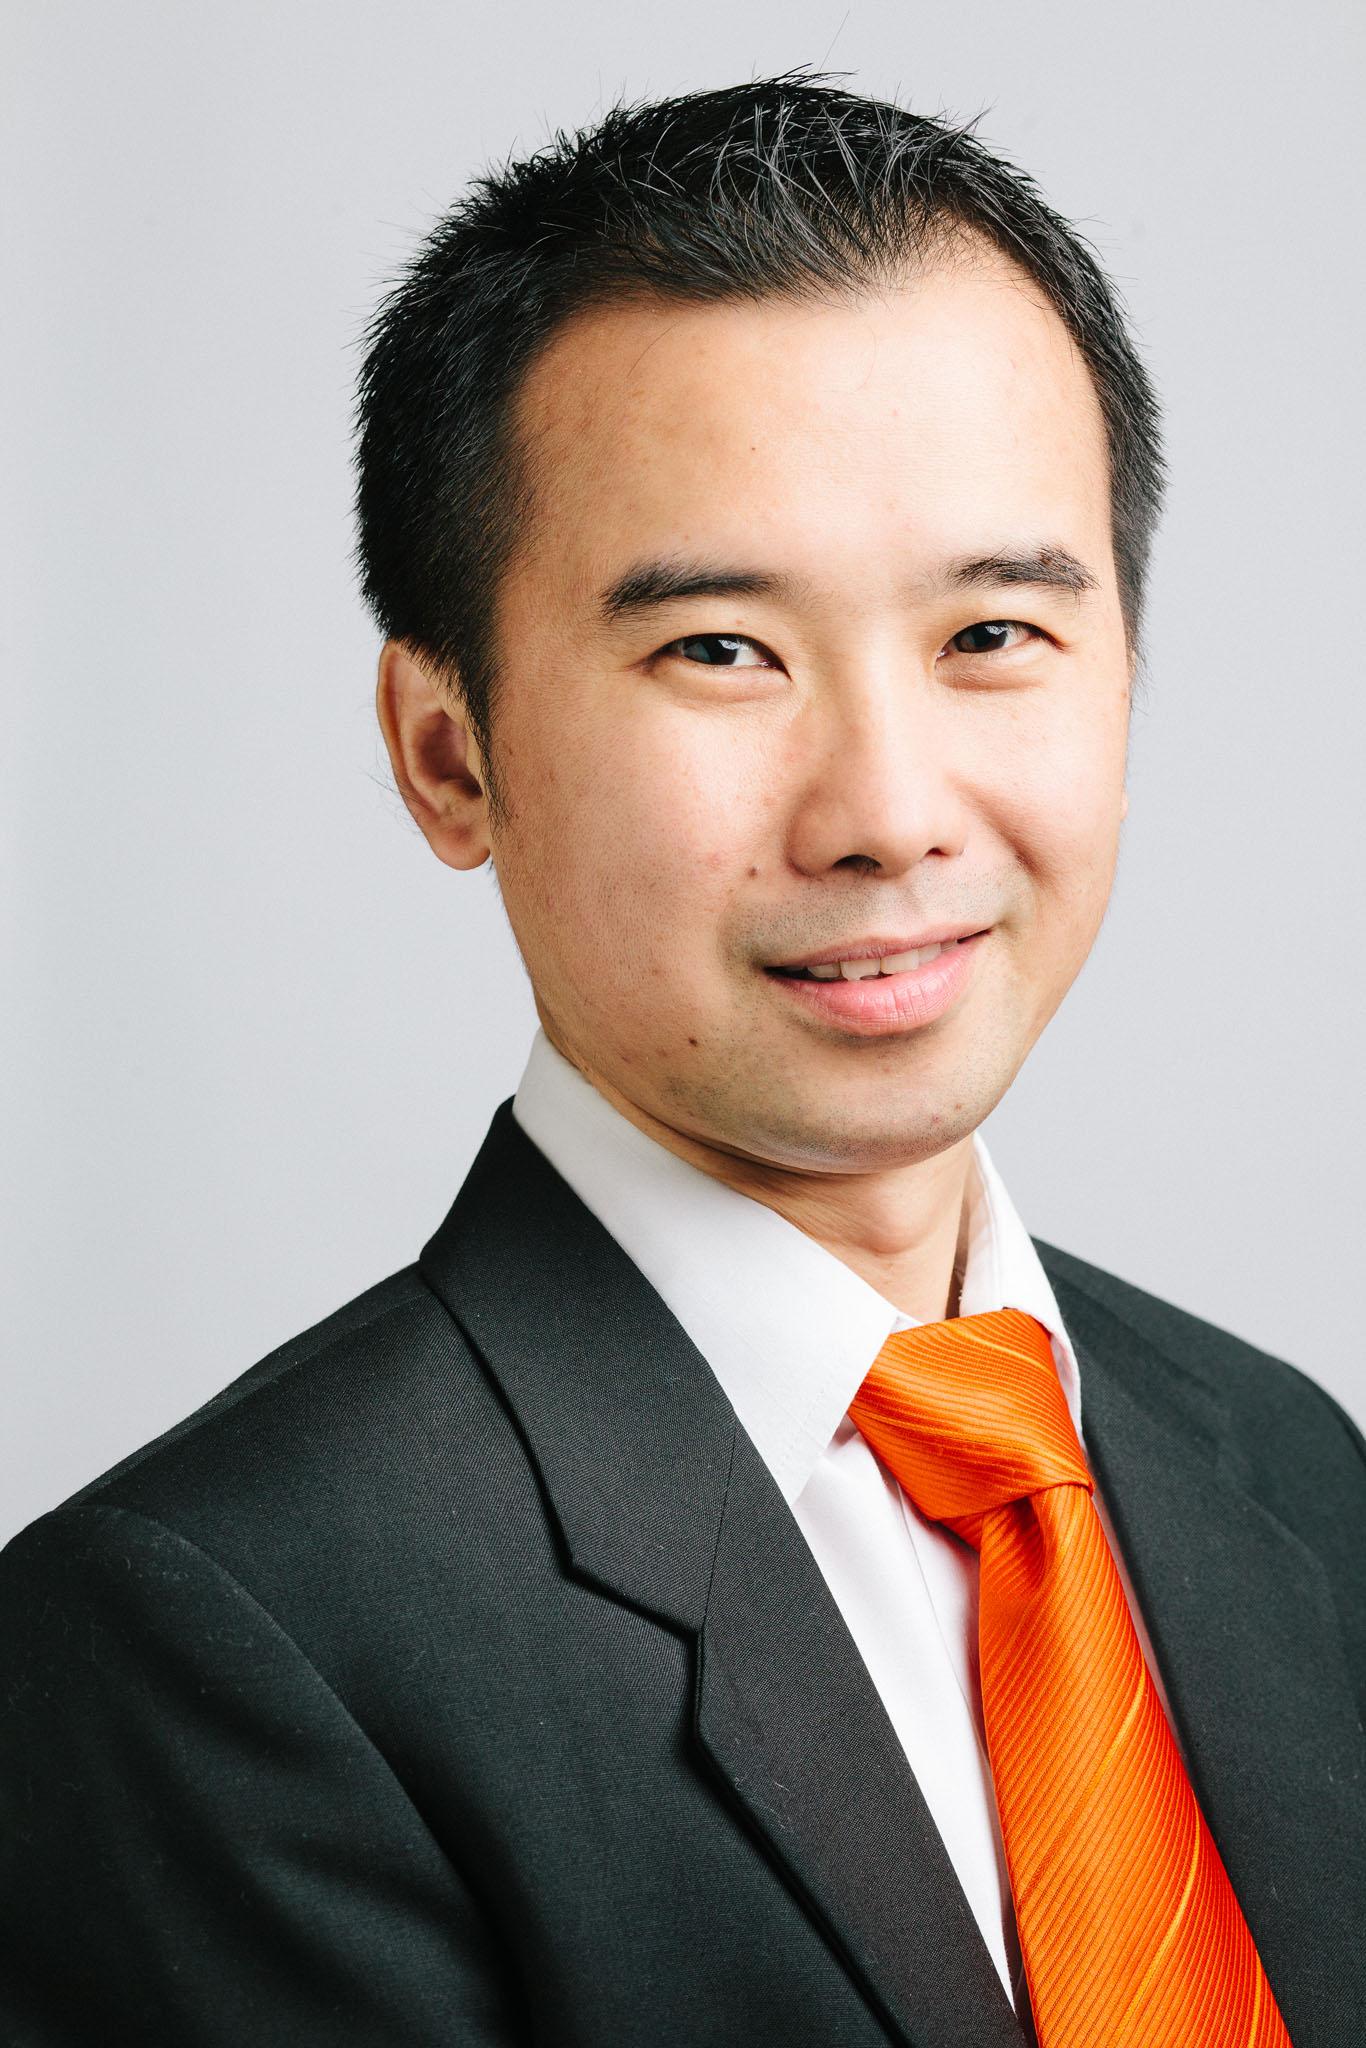 singapore-commercial-editorial-photographer-portraiture-jj-lapp-zakaria-zainal-07.jpg